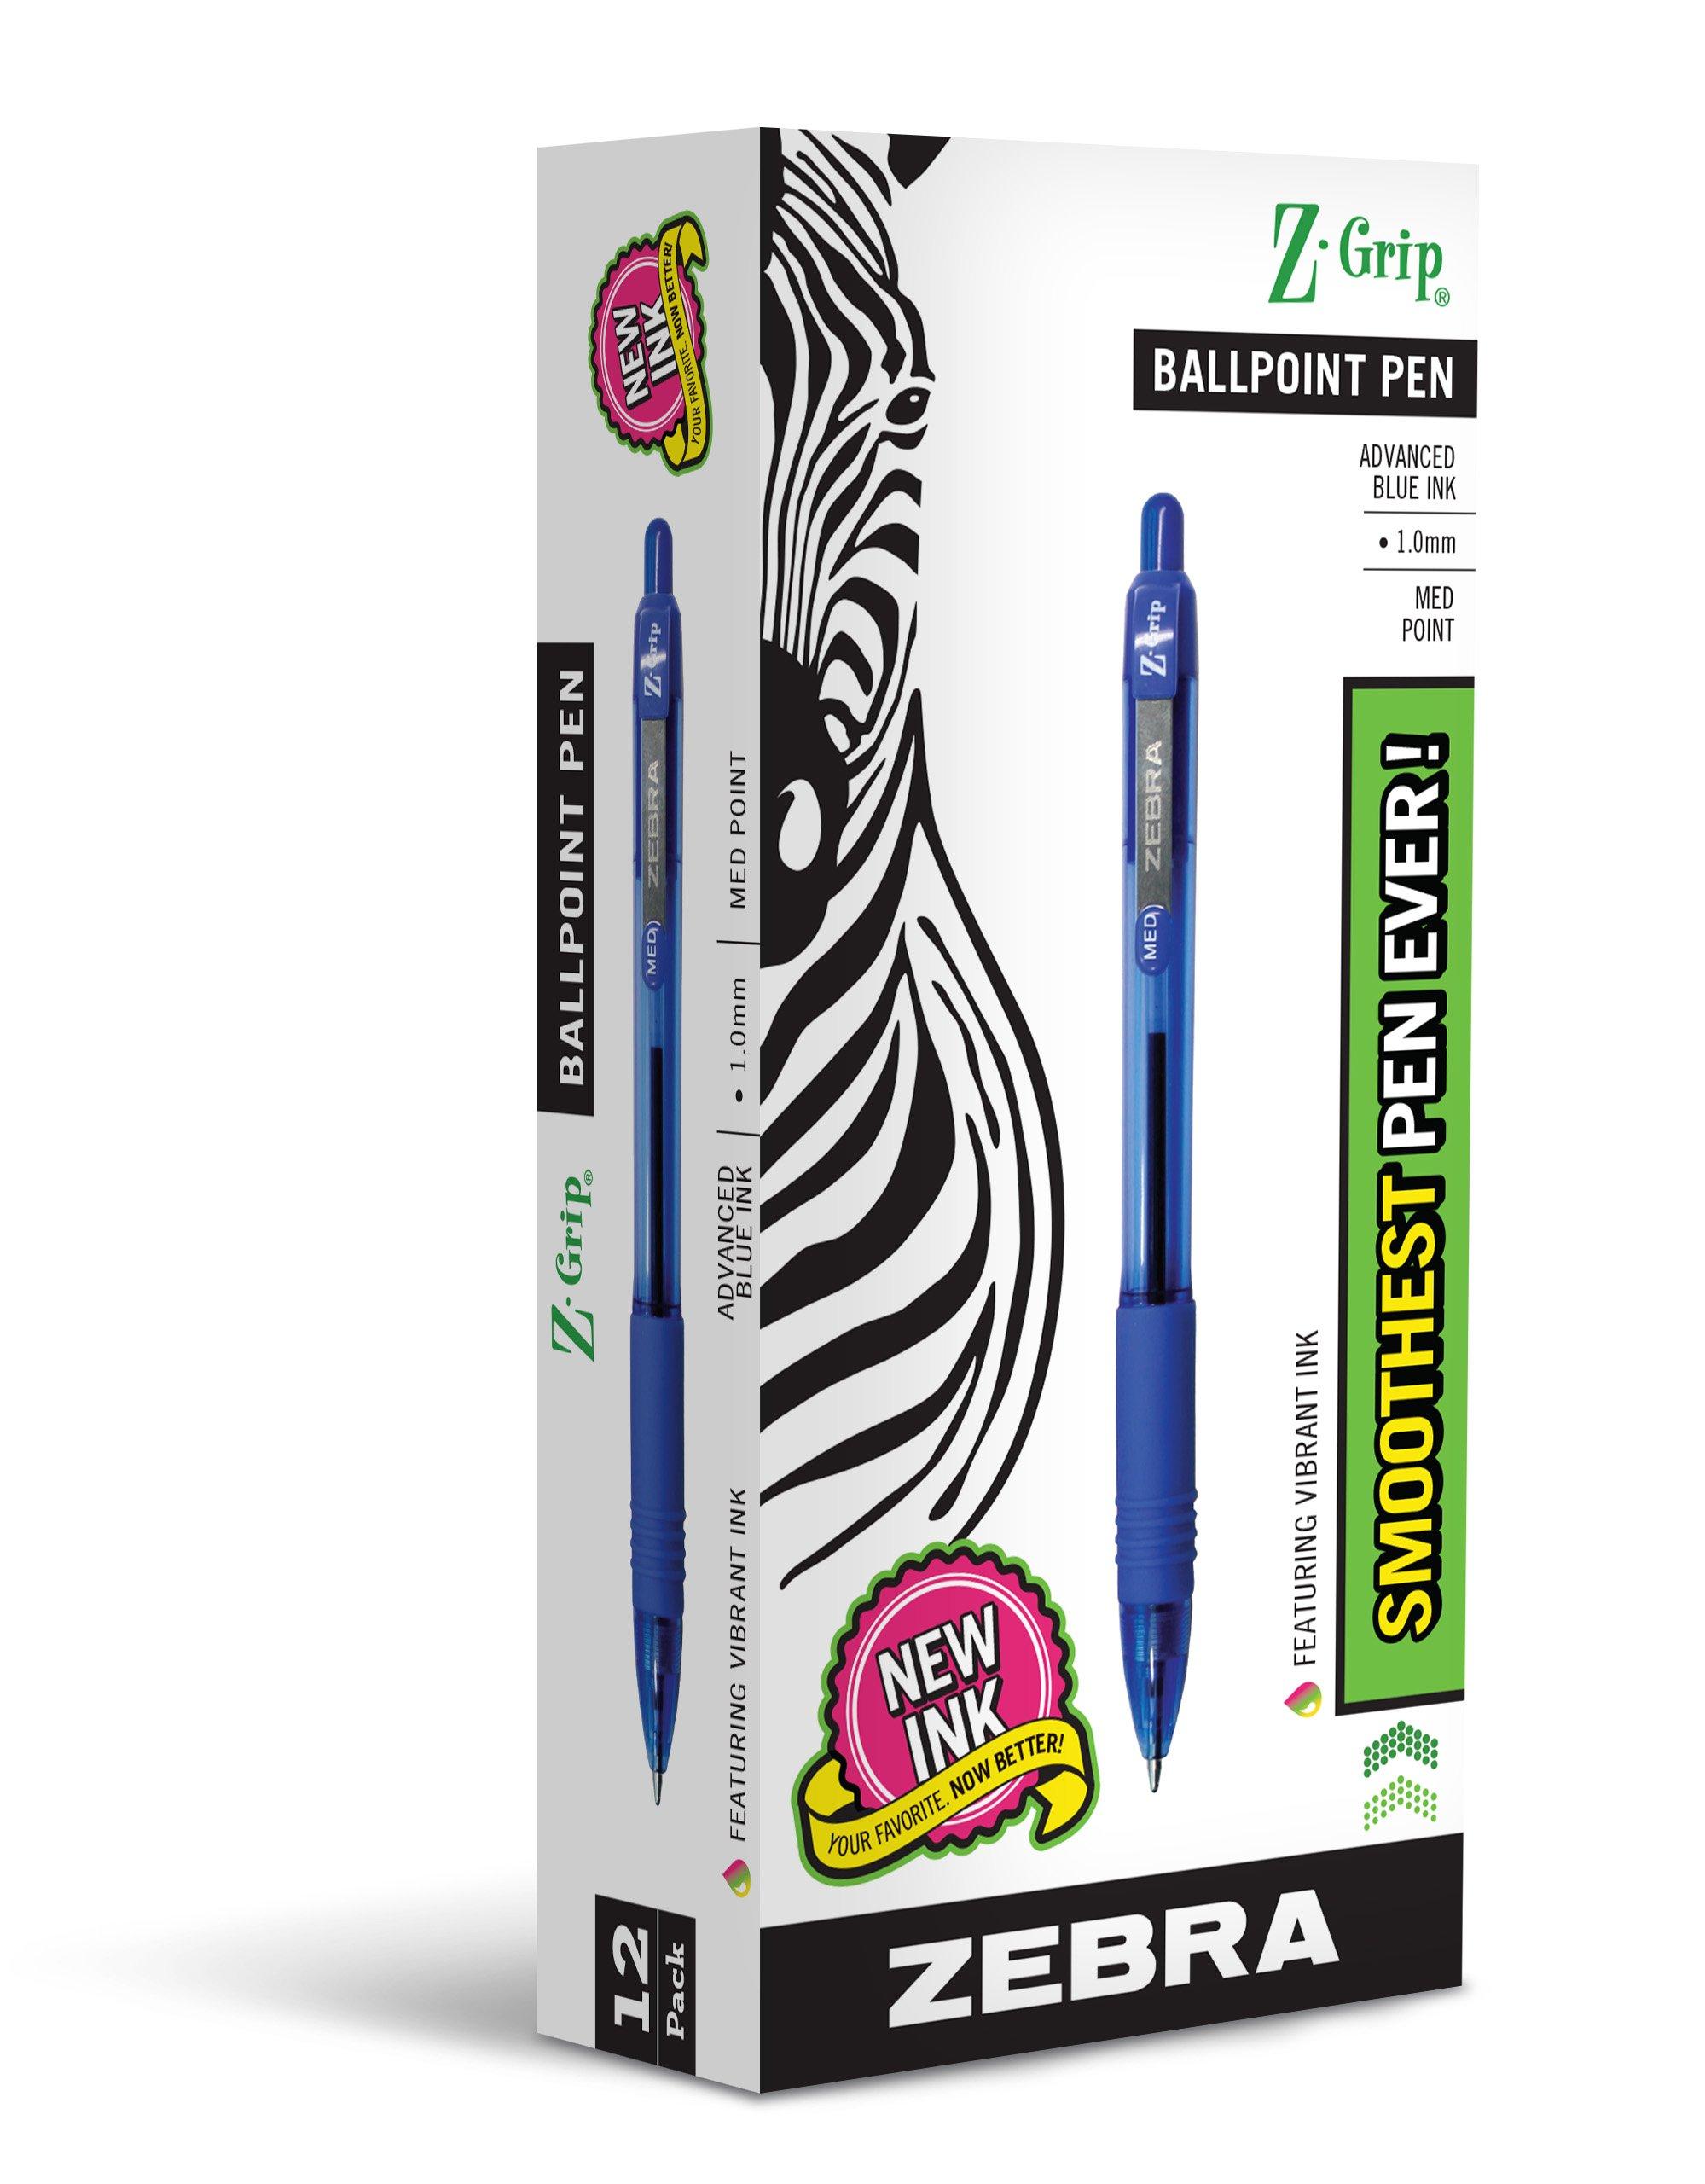 12x Zebra Pen Z-Grip Retractable Ballpoint Pen, Mediu ()